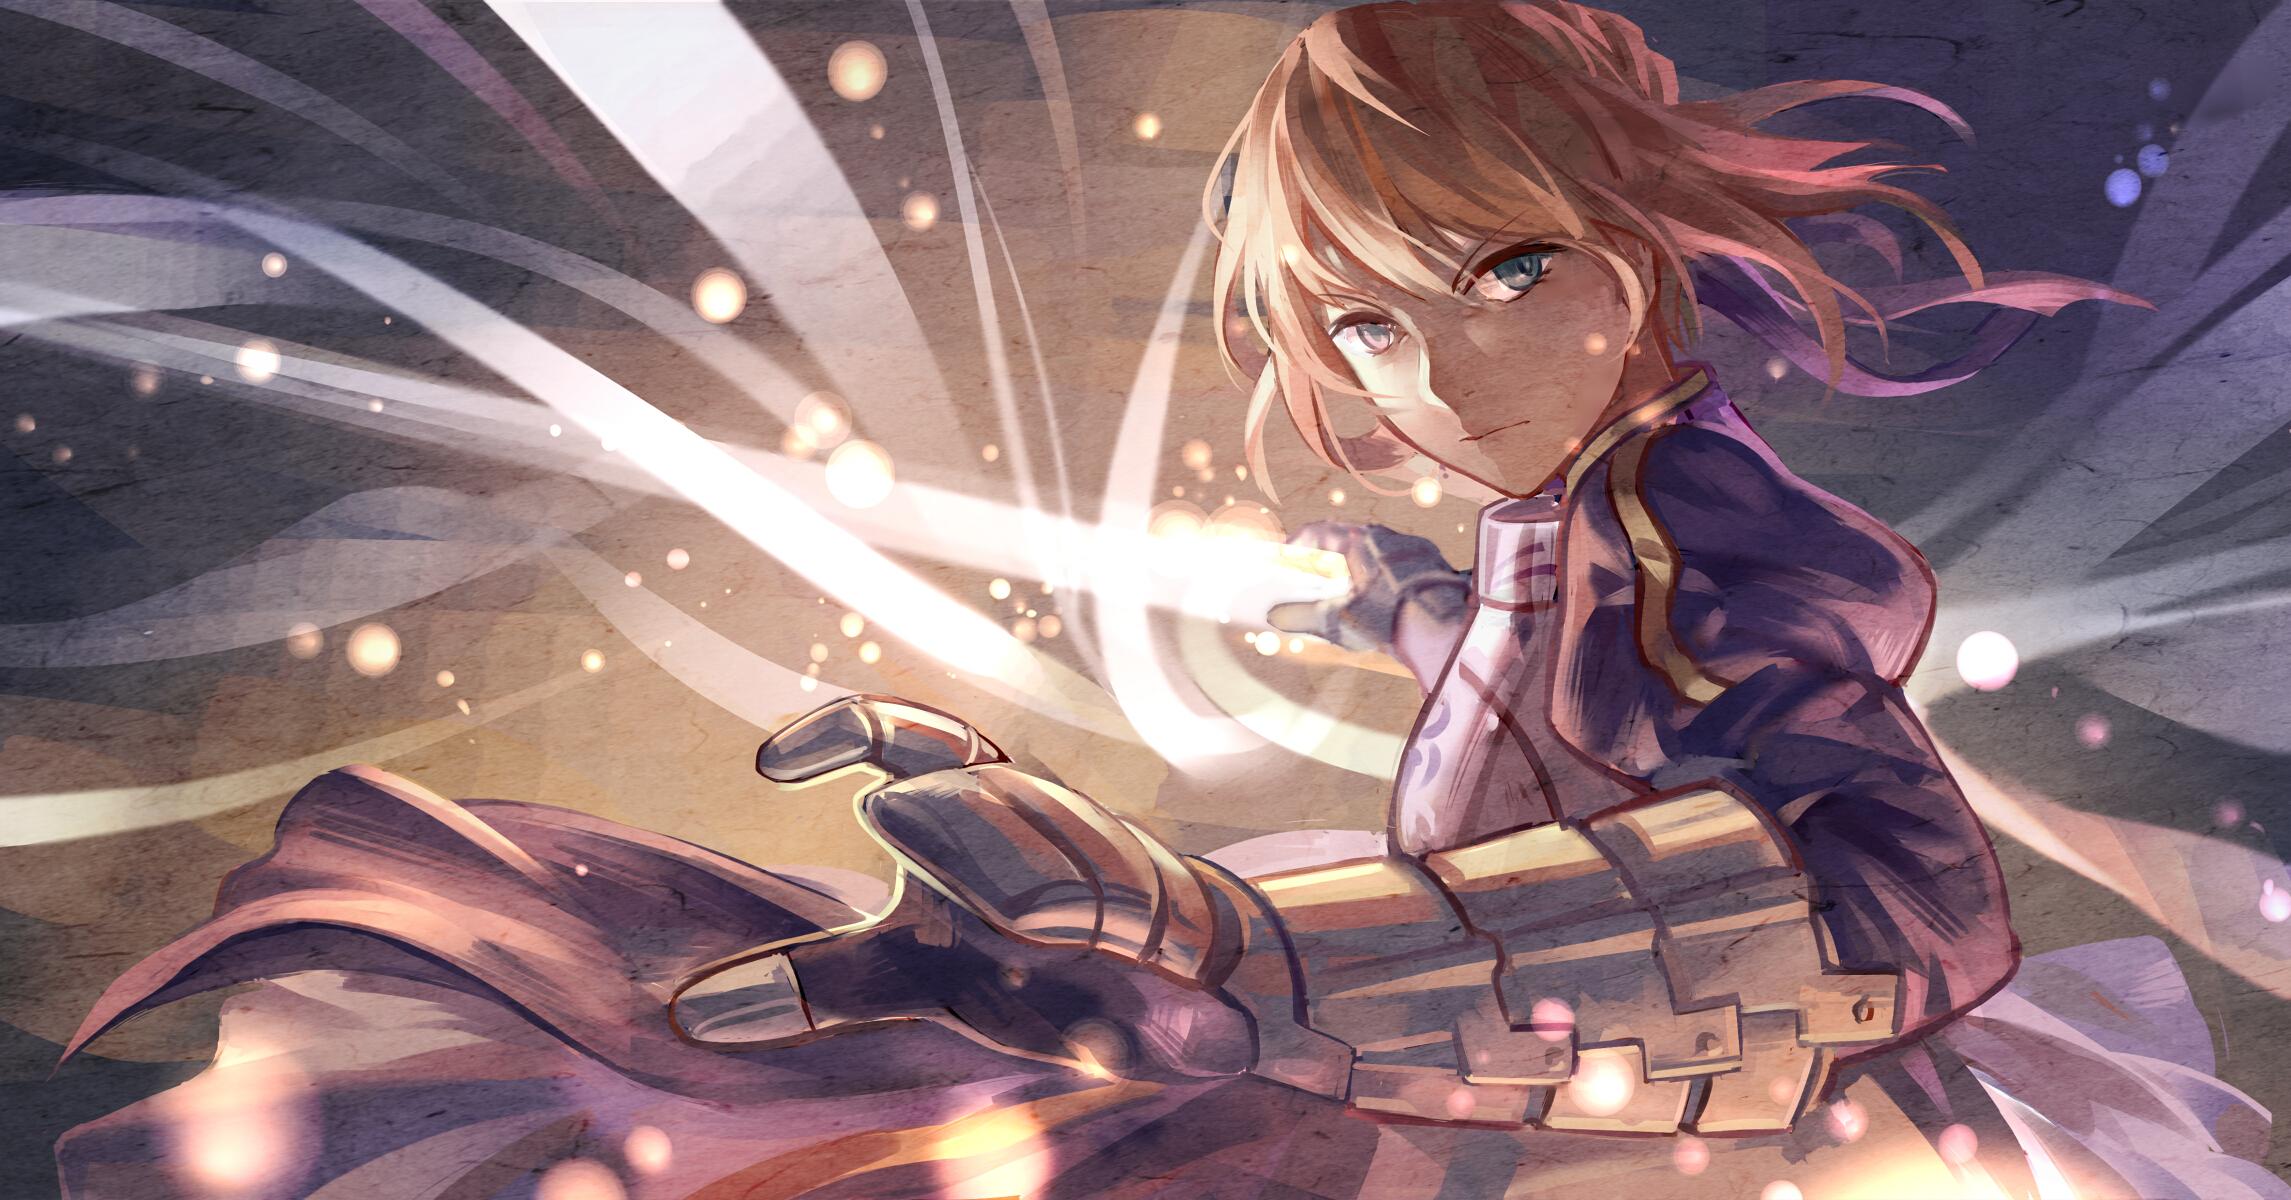 Saber Fate Stay Night Hd Wallpaper 1818946 Zerochan Anime